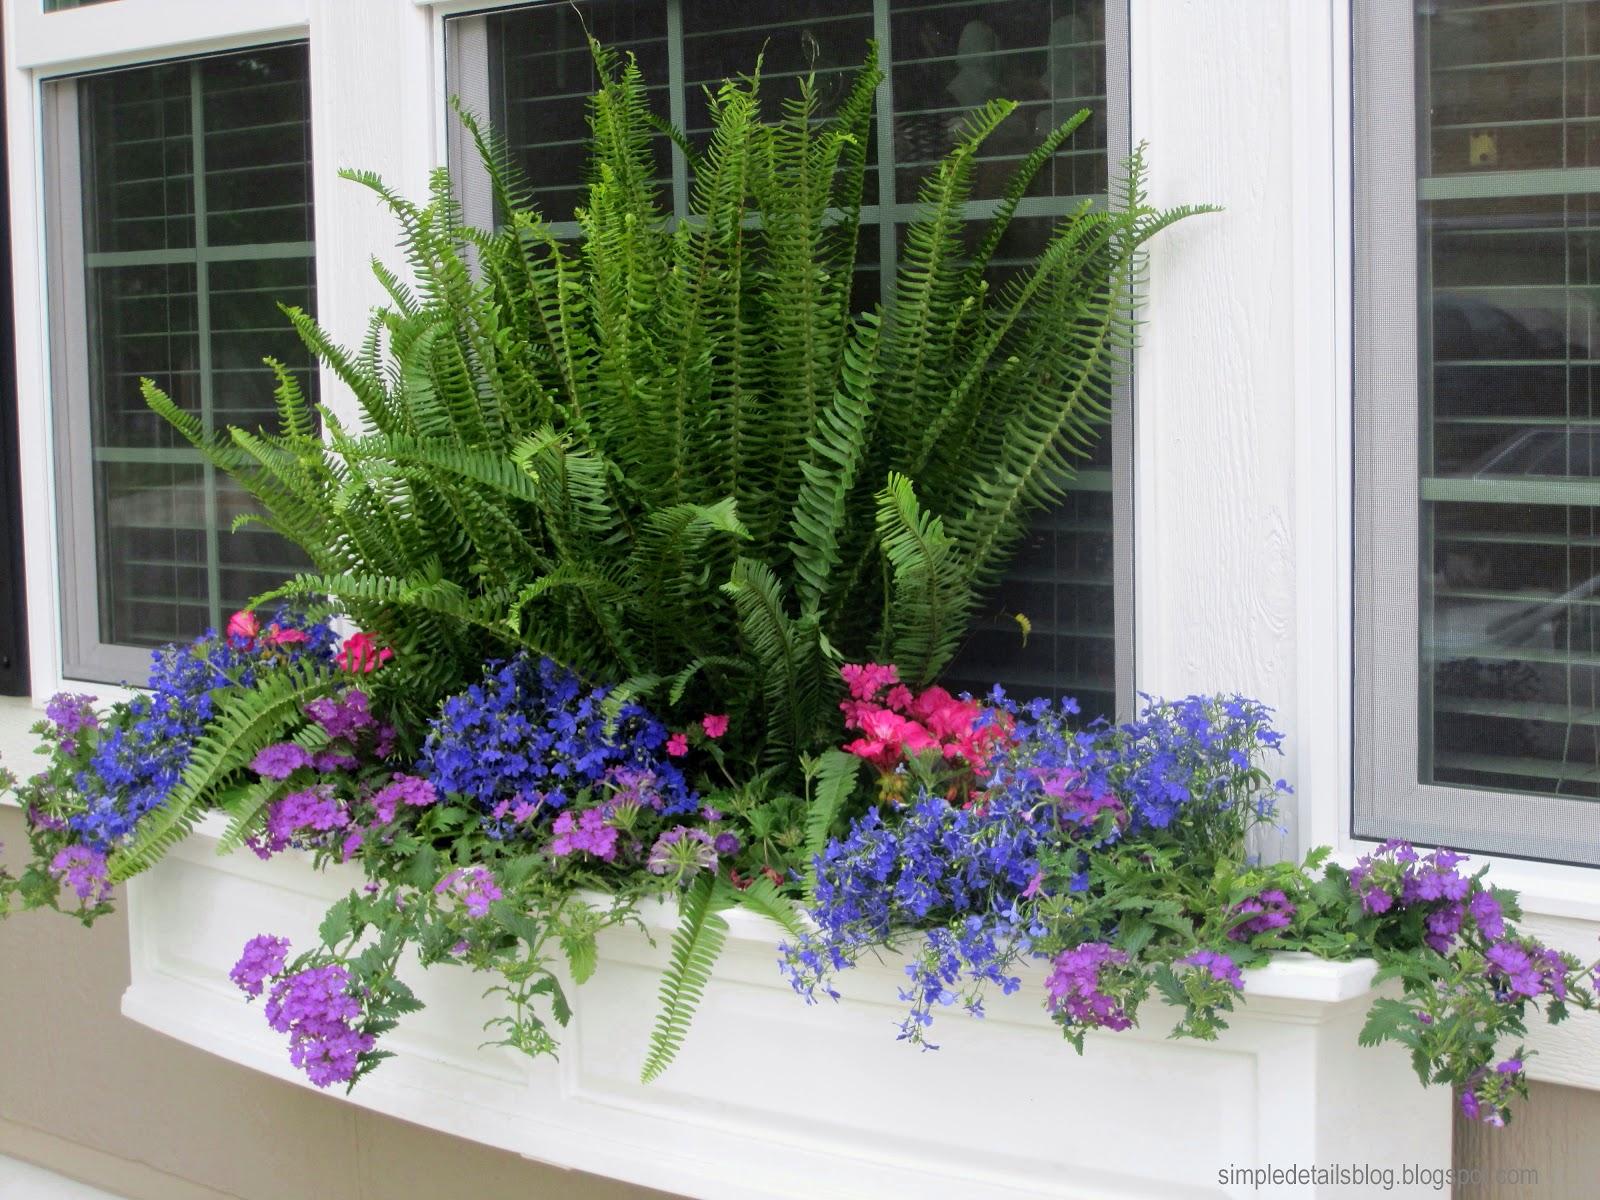 Simple Details: cottage style window box